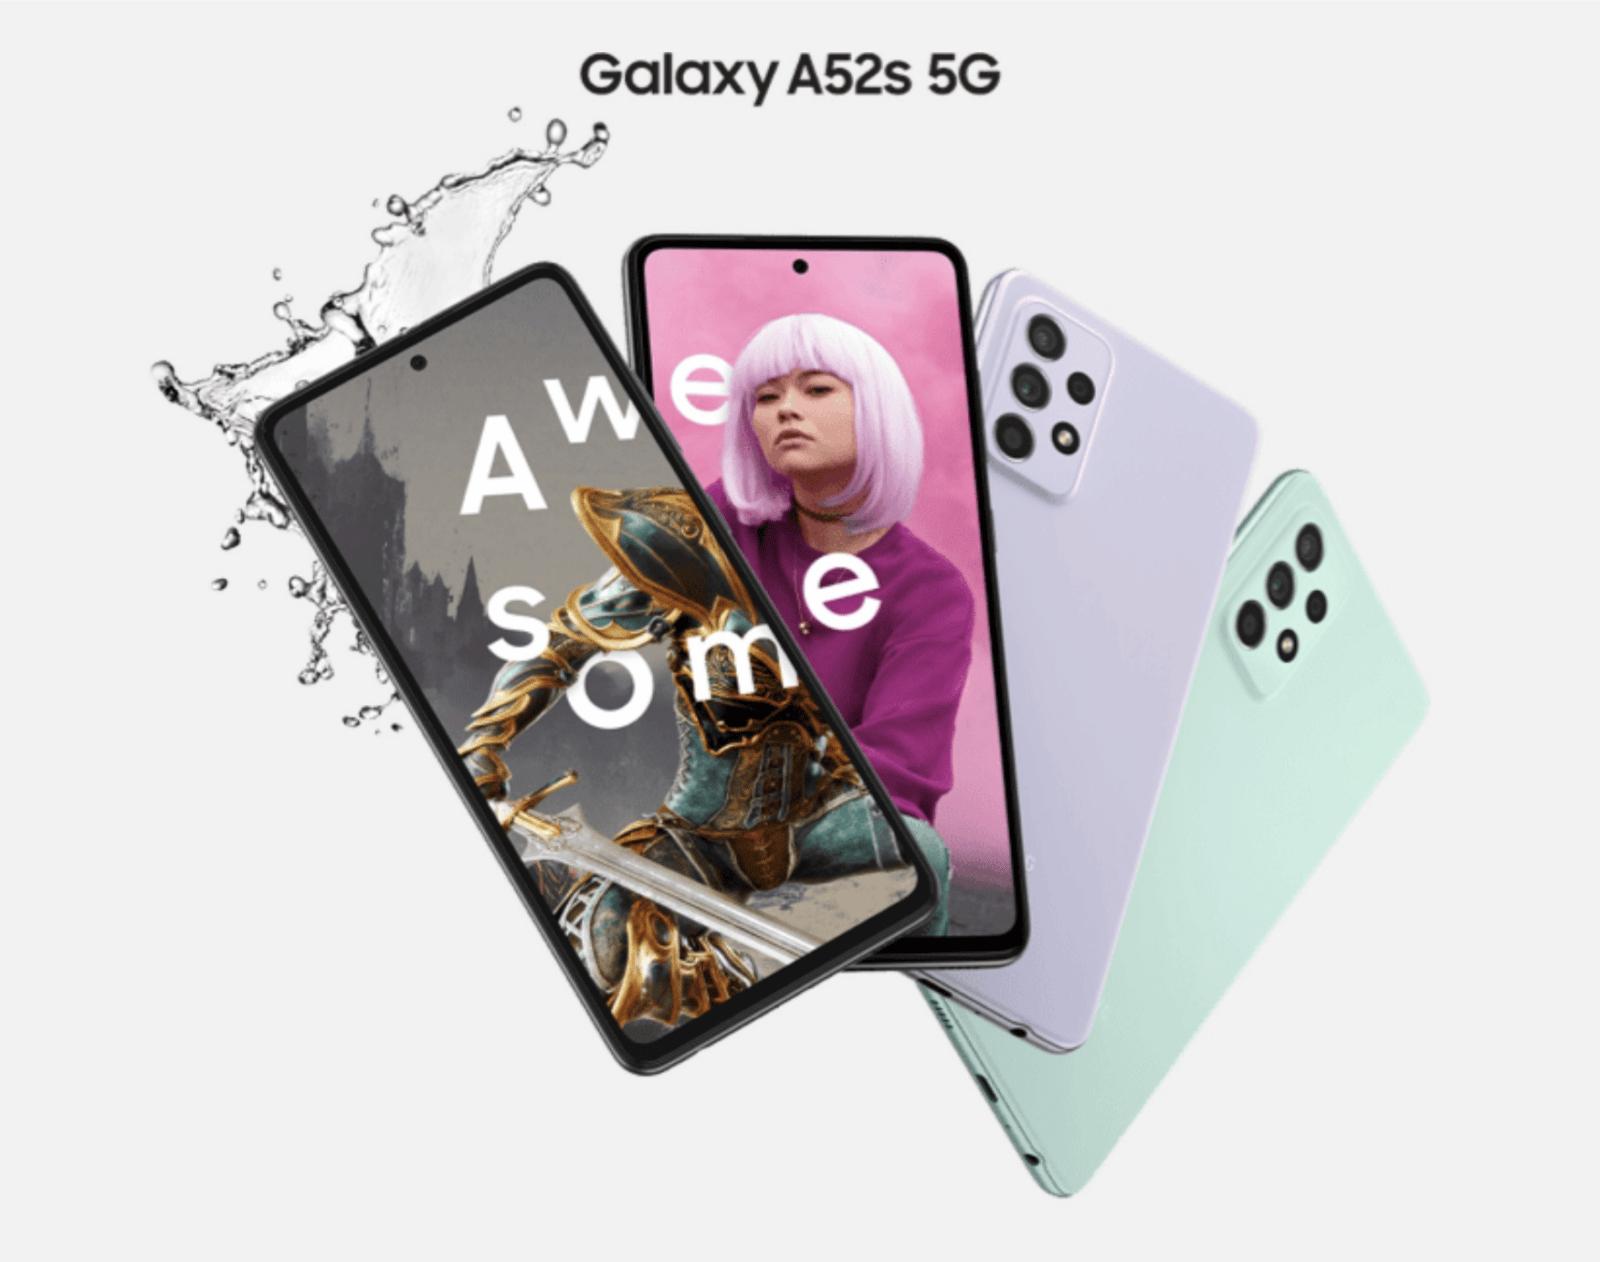 Galaxy-A52s-5G-Samsung-smartphone